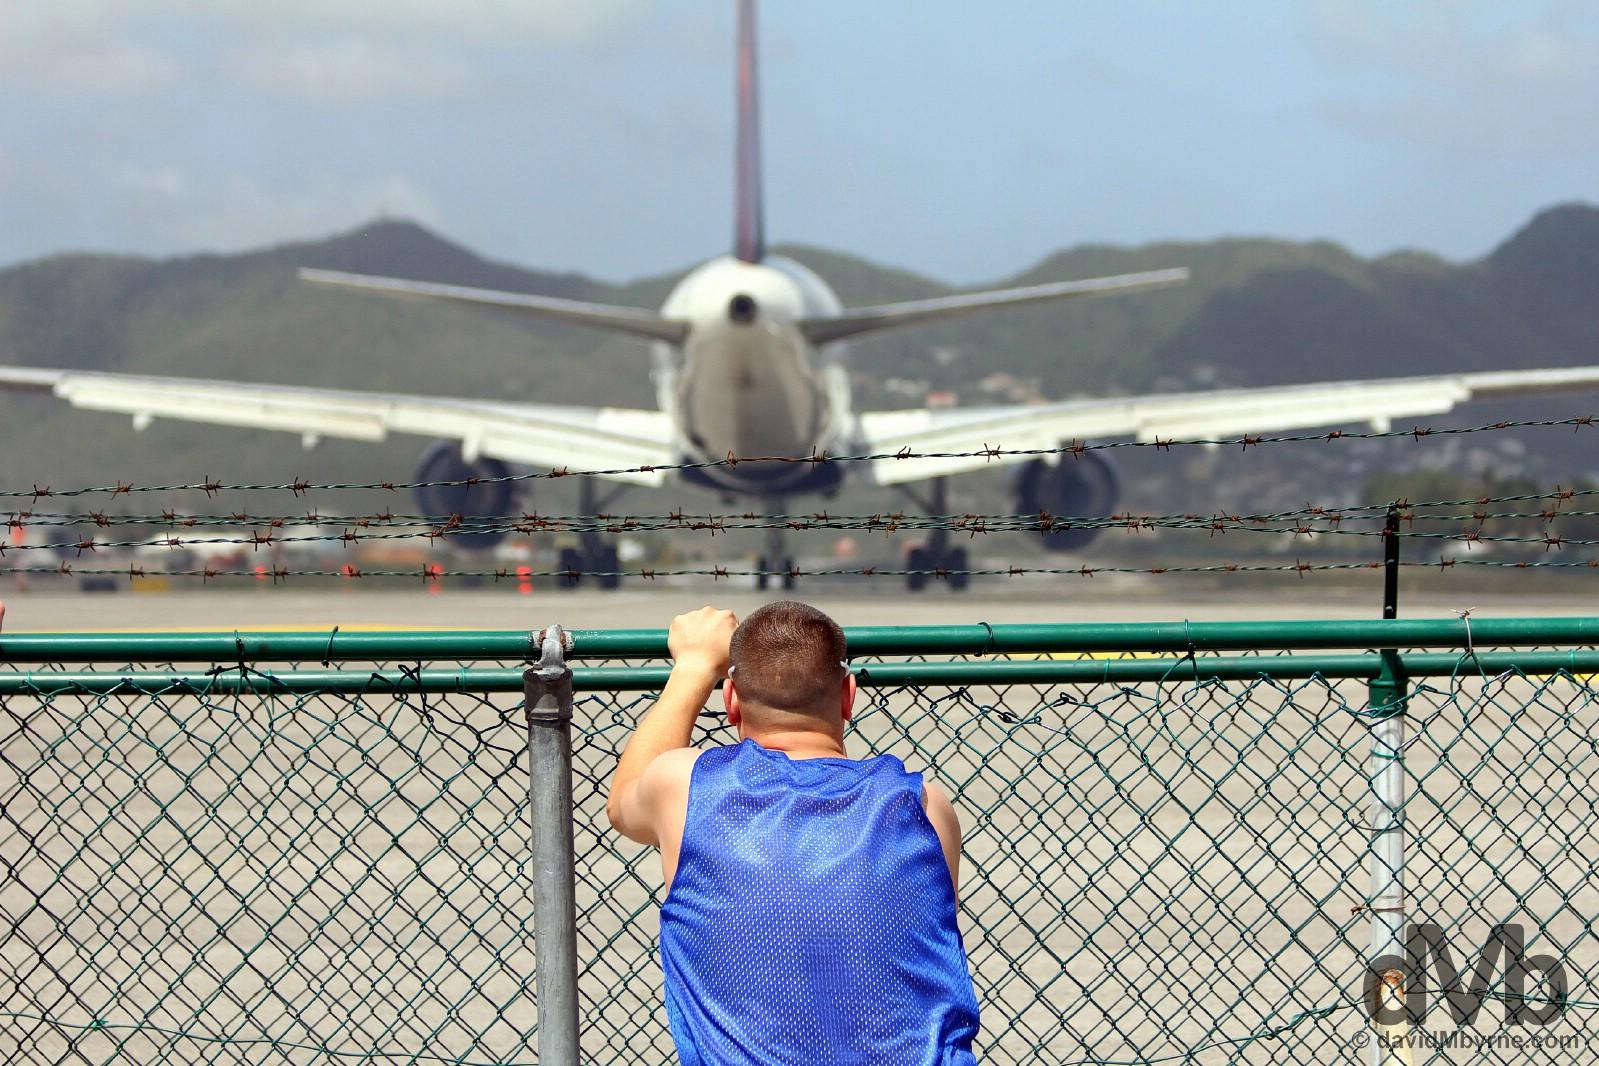 Riding The Fence. Maho Bay, Sint Maarten, Lesser Antilles. June 8, 2015.